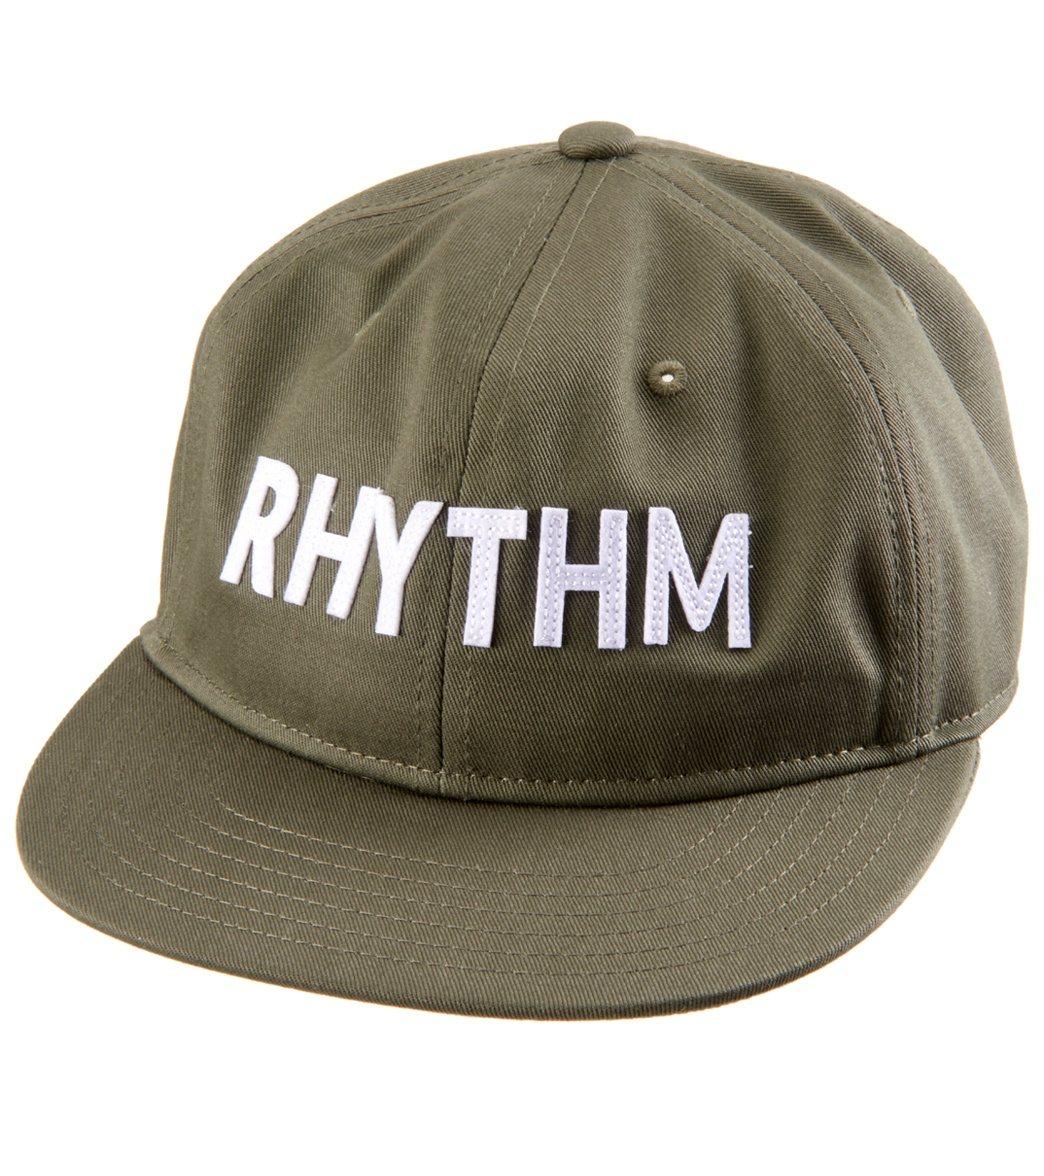 85cc82d9bc7f7 Rhythm Men s Everyday Hat at SwimOutlet.com